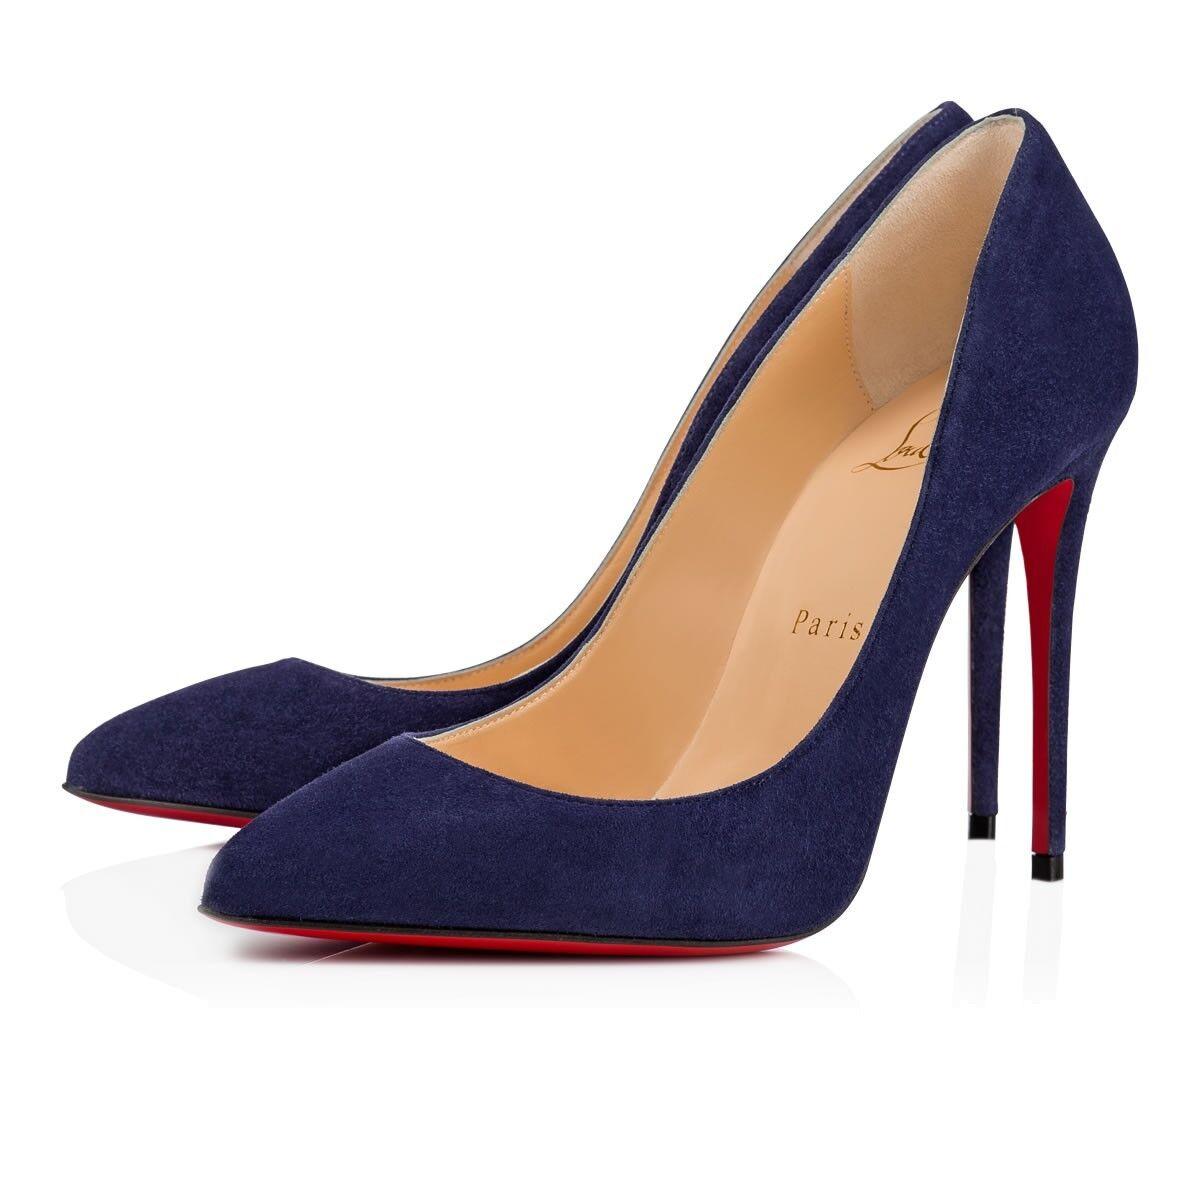 NIB Suede Christian Louboutin Pigalle Follies 100 China Blau Suede NIB Heel Pump Schuhe 36.5 8508e0